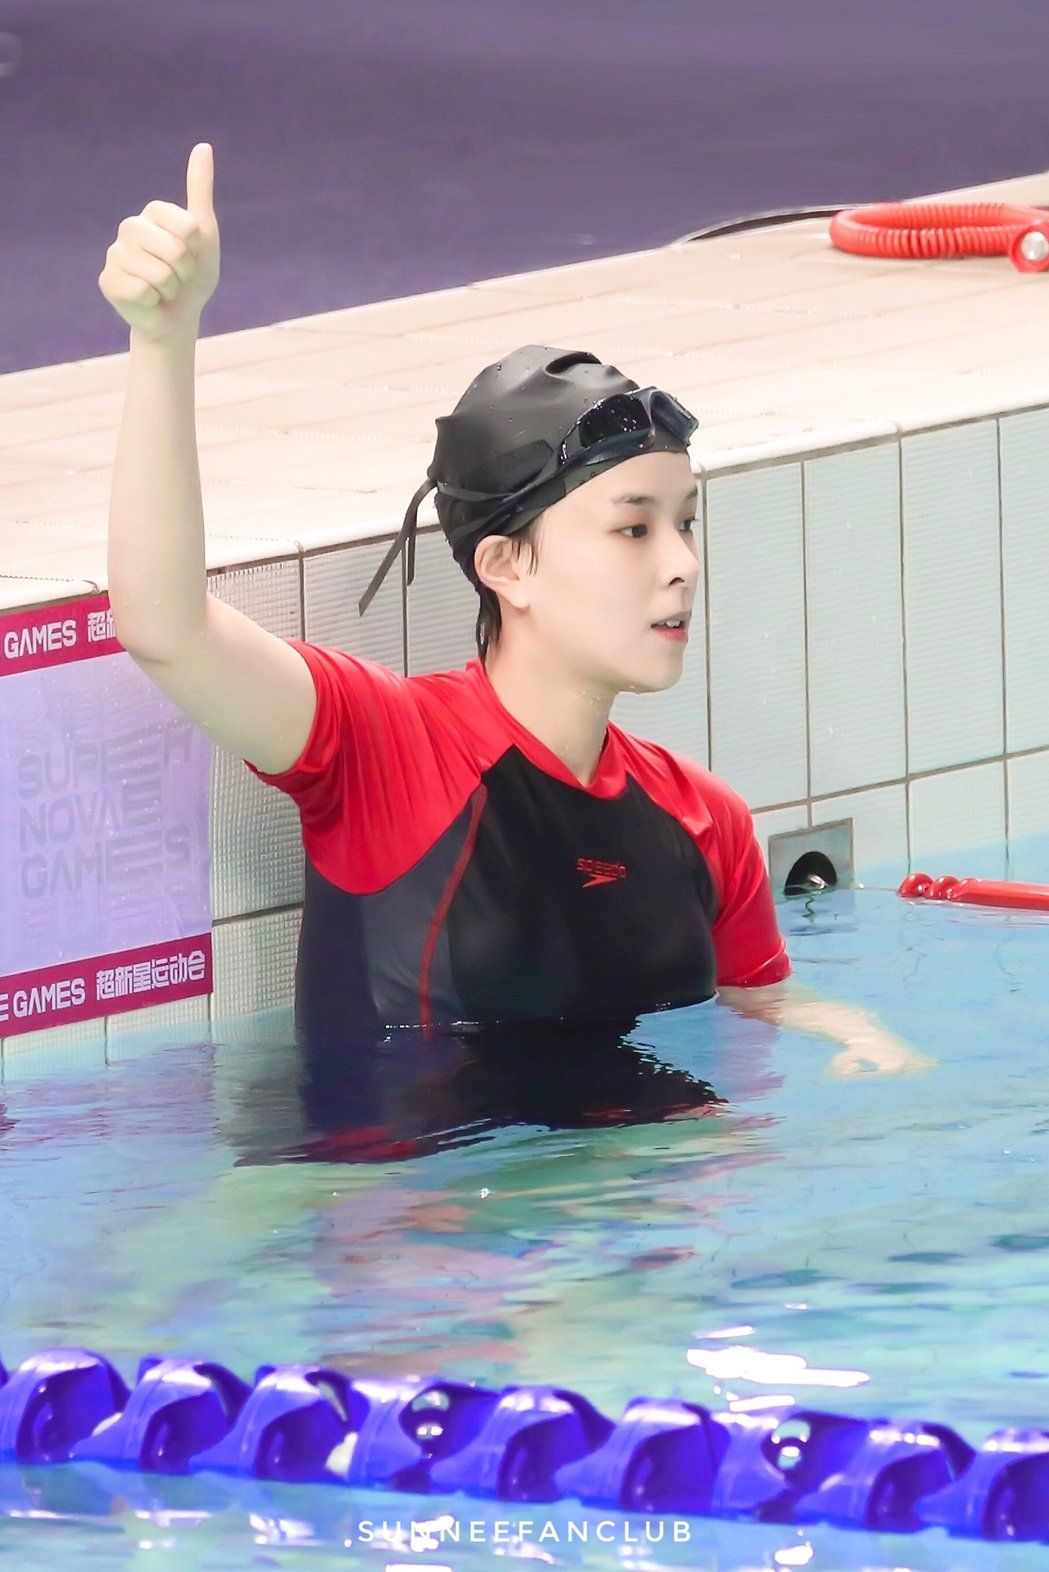 Sunnee楊芸晴獲得個人賽冠軍。圖/擷自微博